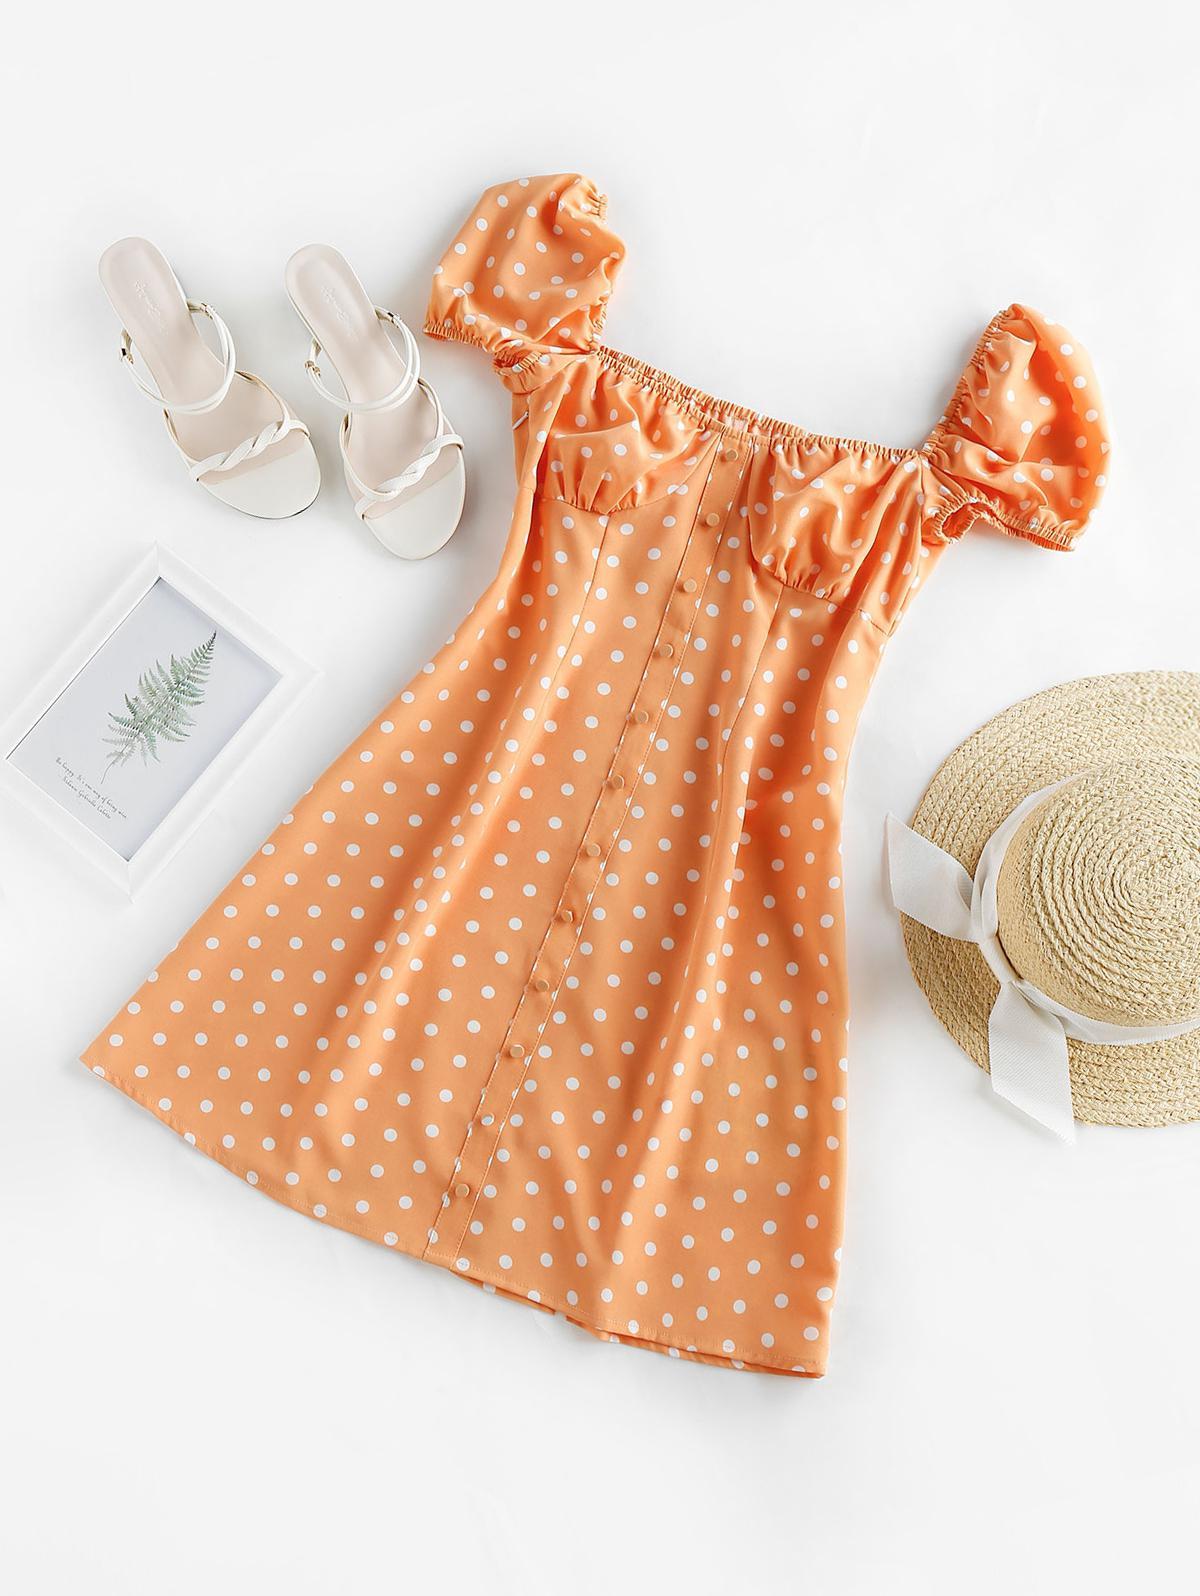 ZAFUL Polka Dot Button Embellished Cupped Dress